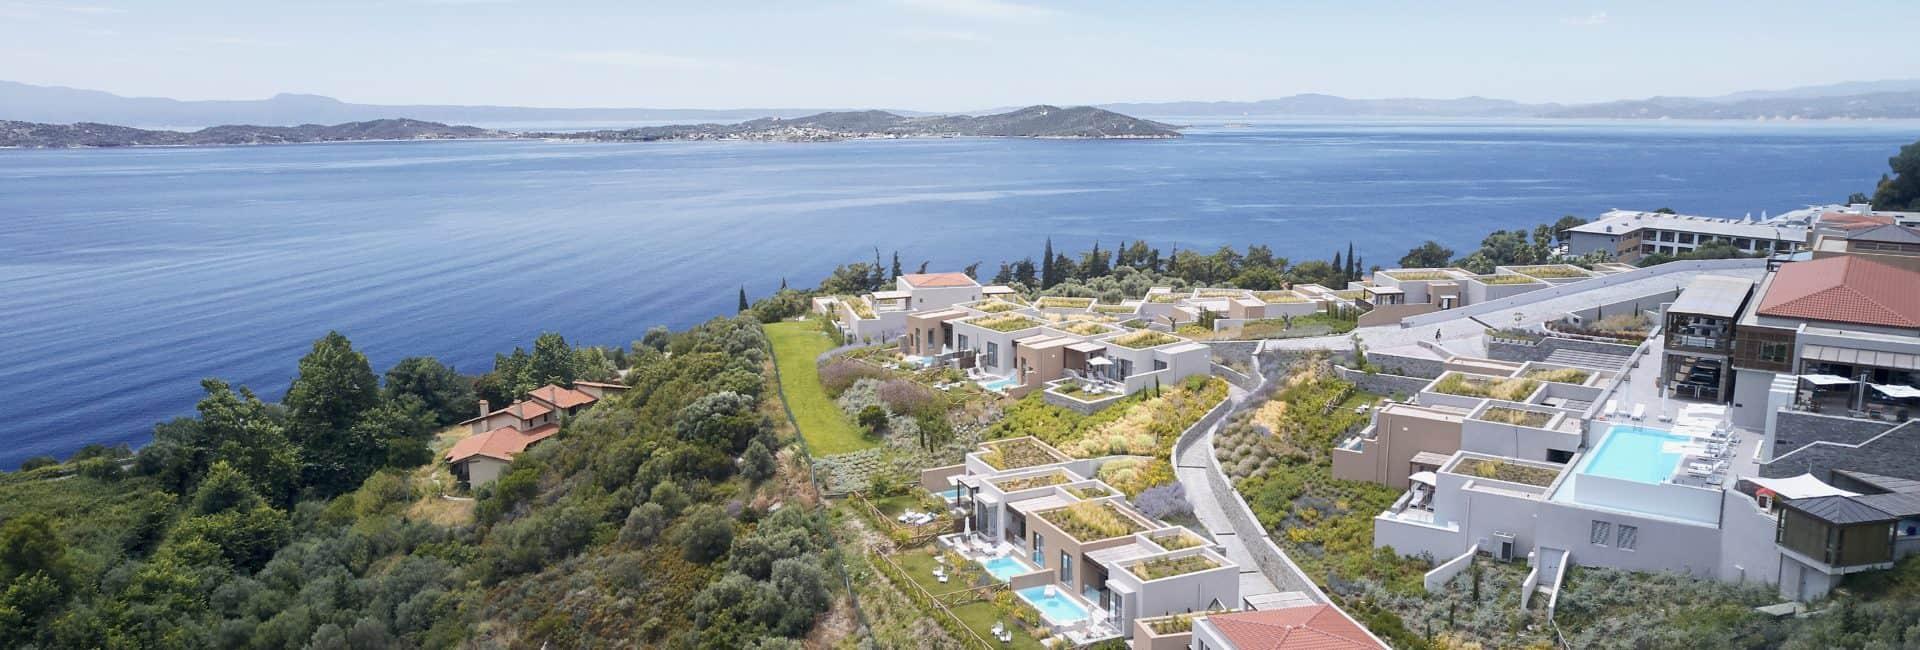 Eagles Villas Halkidiki